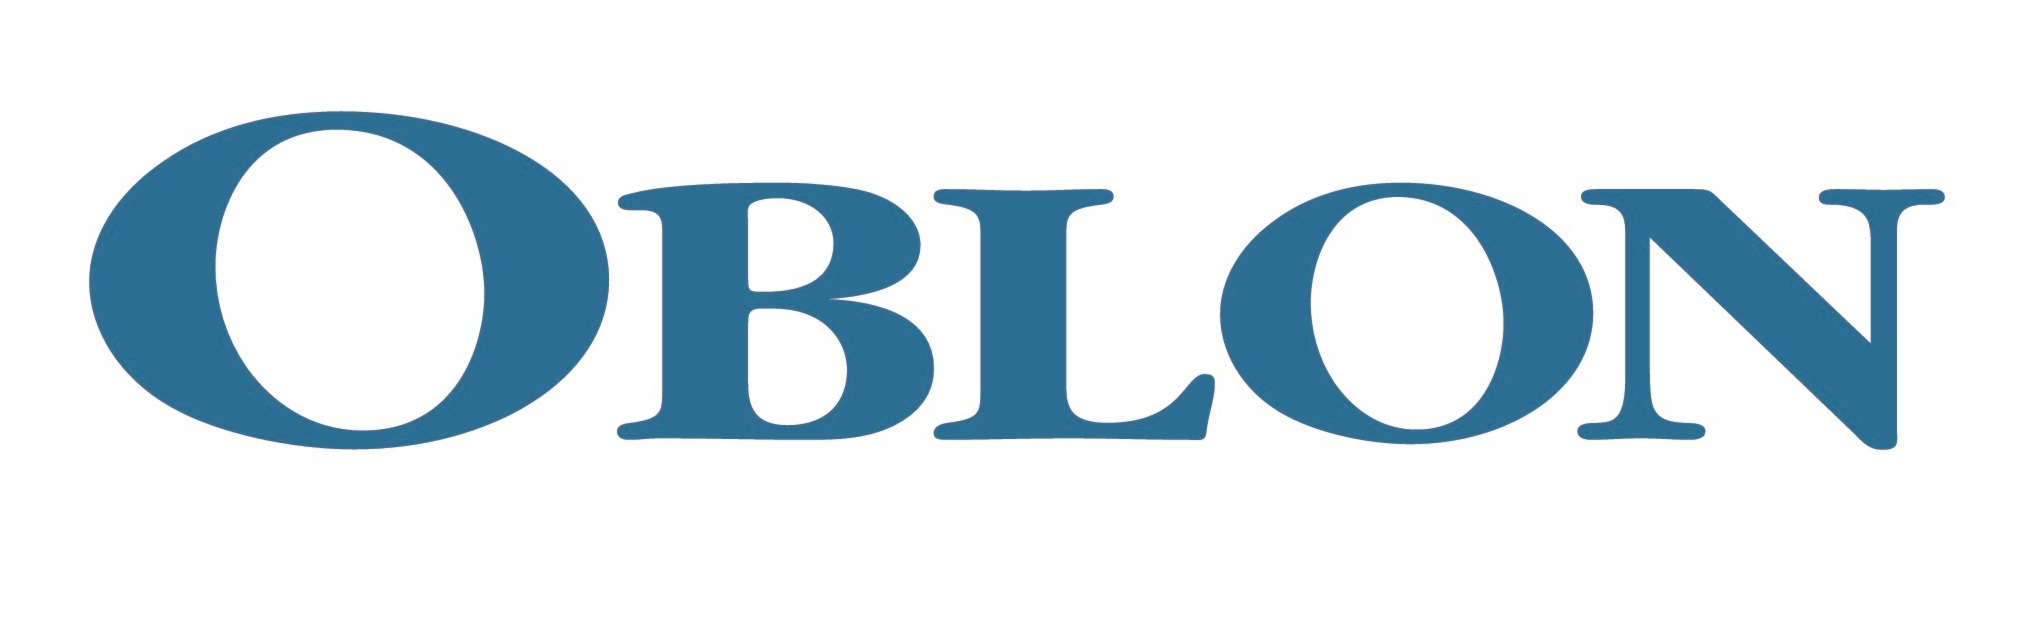 5225_Oblon_logo_Blue_Corp